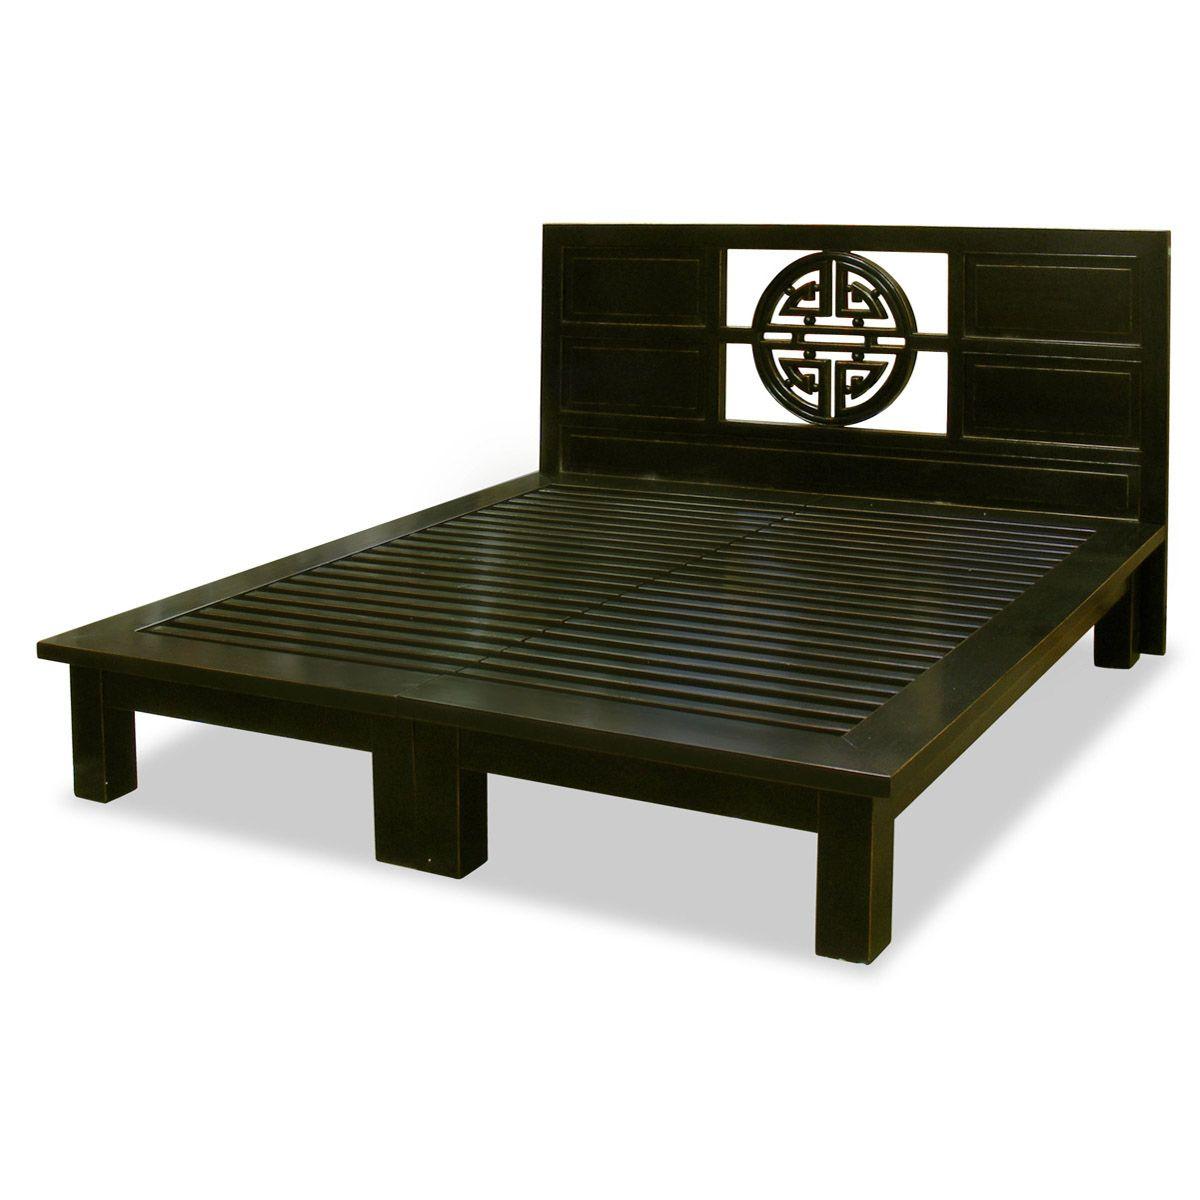 Elmwood Yuan Yuan King Platform Bed Influenced By Japanese Tatami